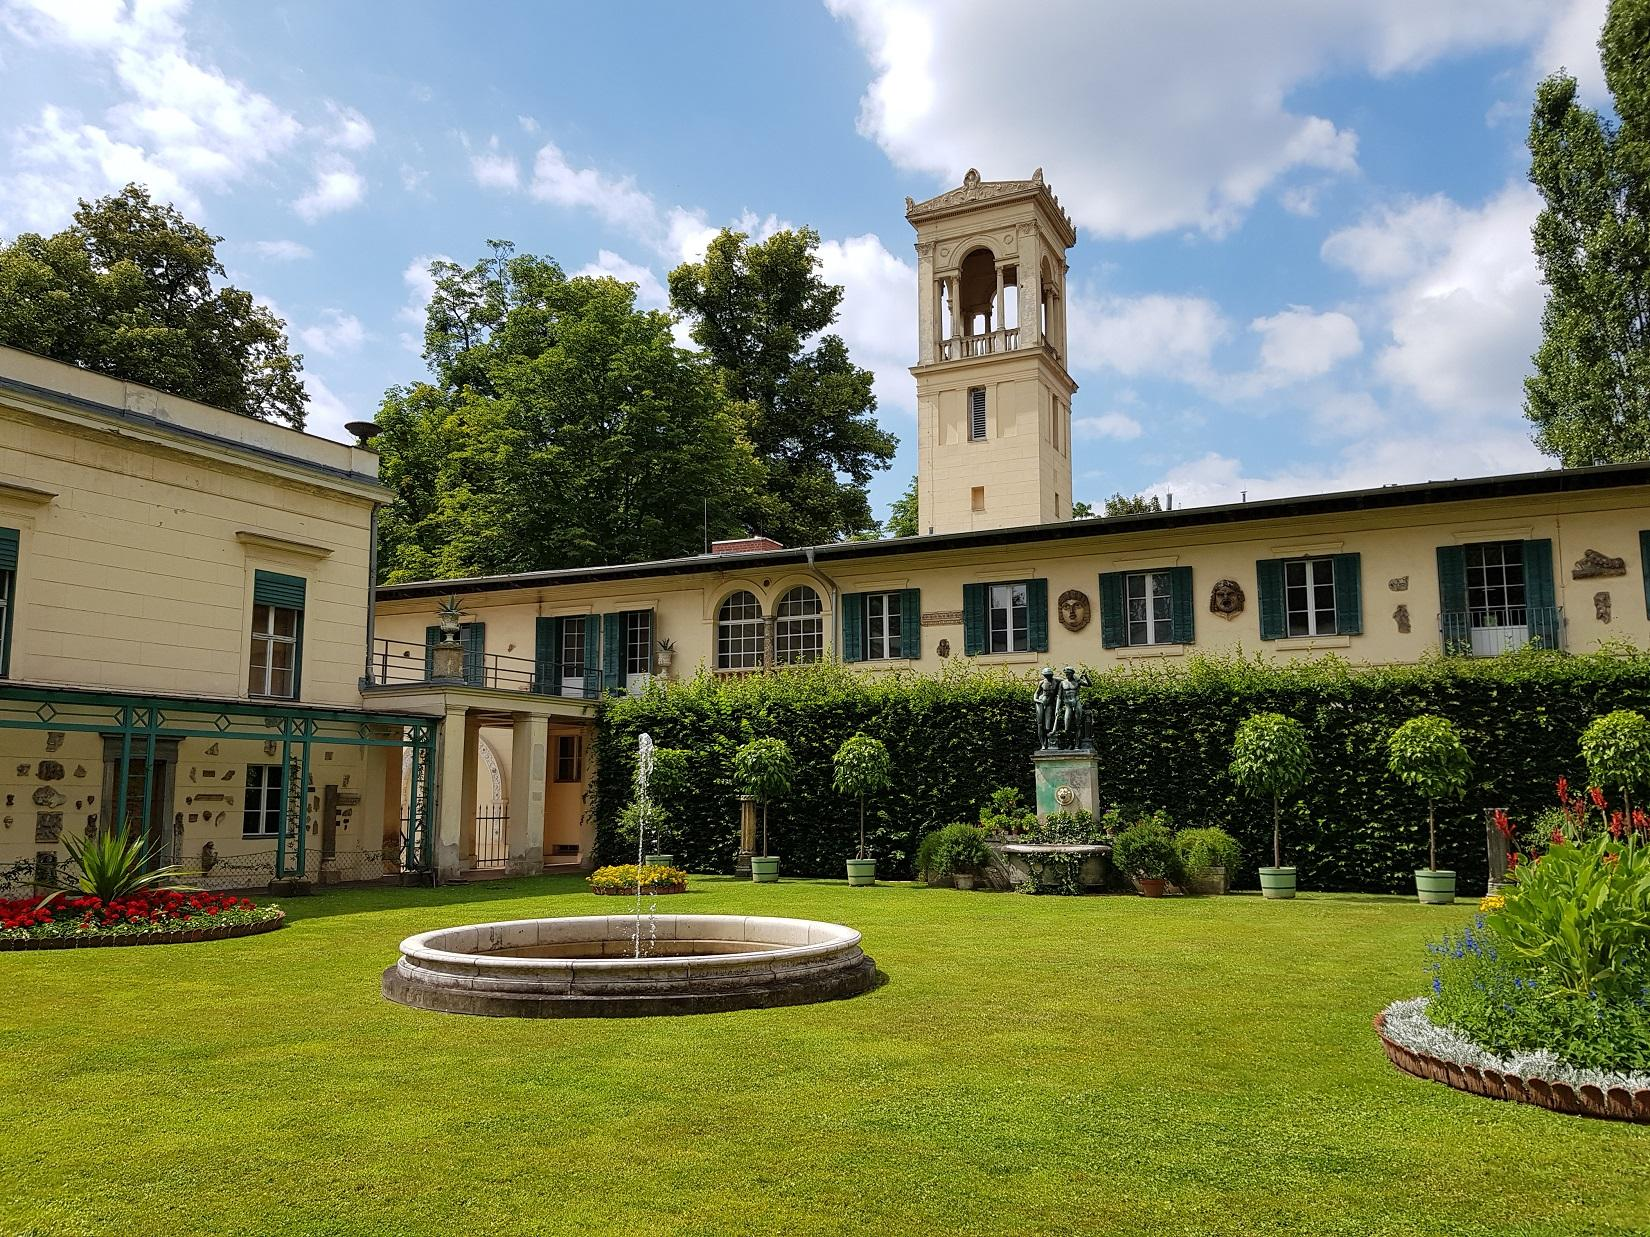 Innenhof von Schloss Glienicke, Foto (c) Andrea Hahn | Text & Presse